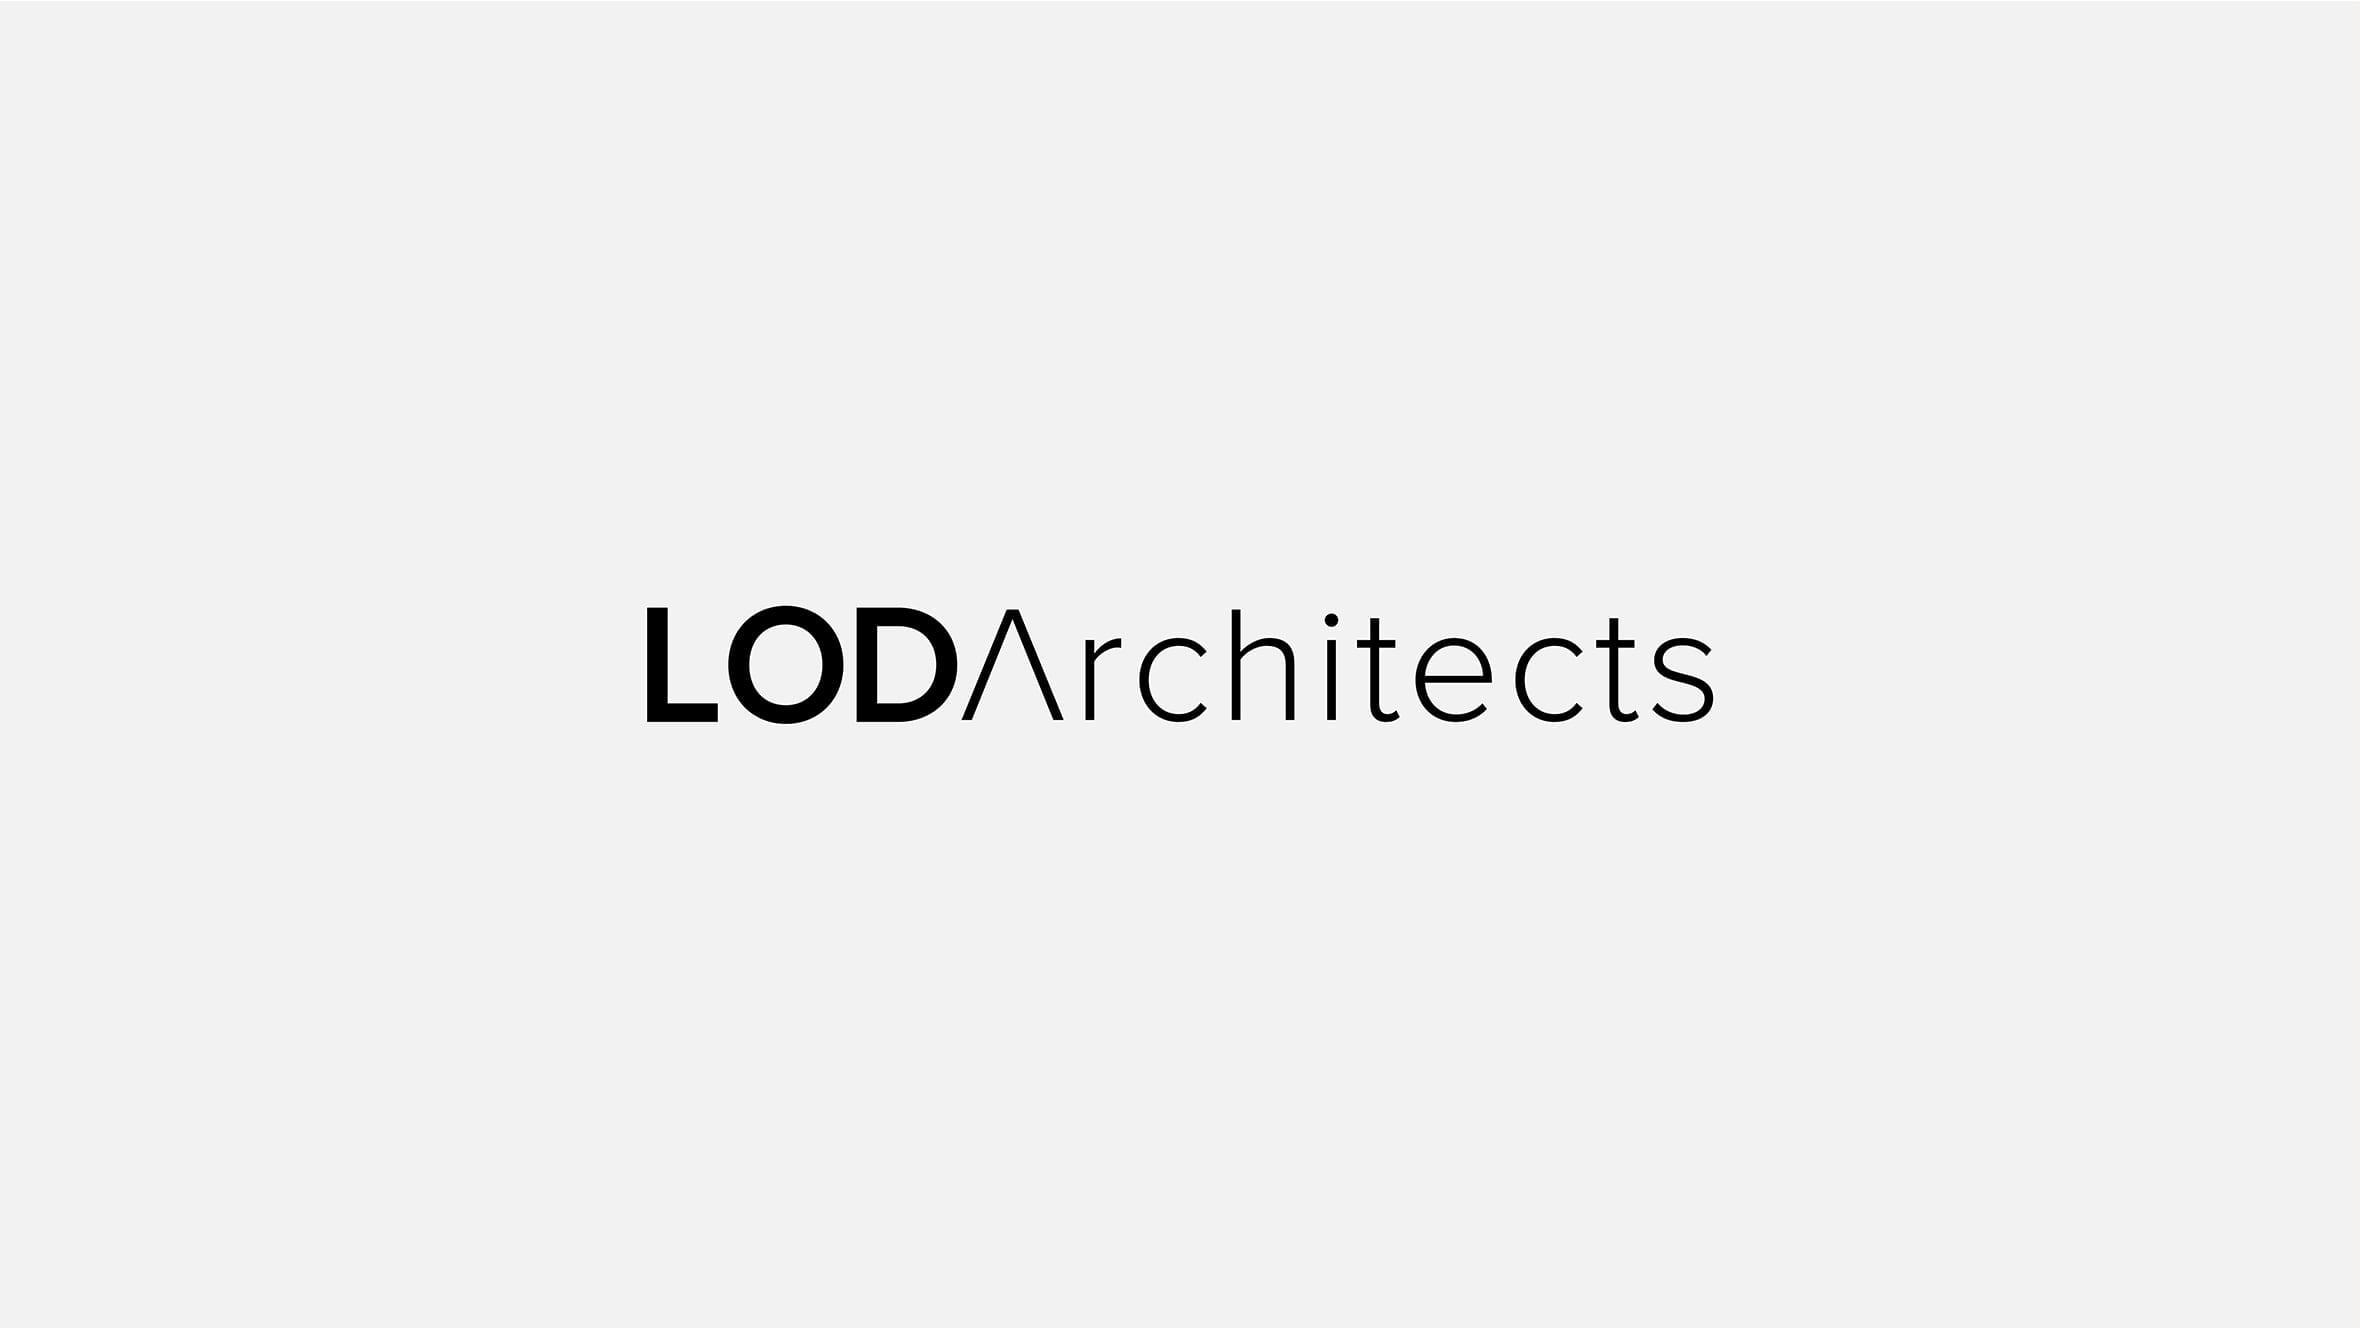 LOD Architects Brand Strategy